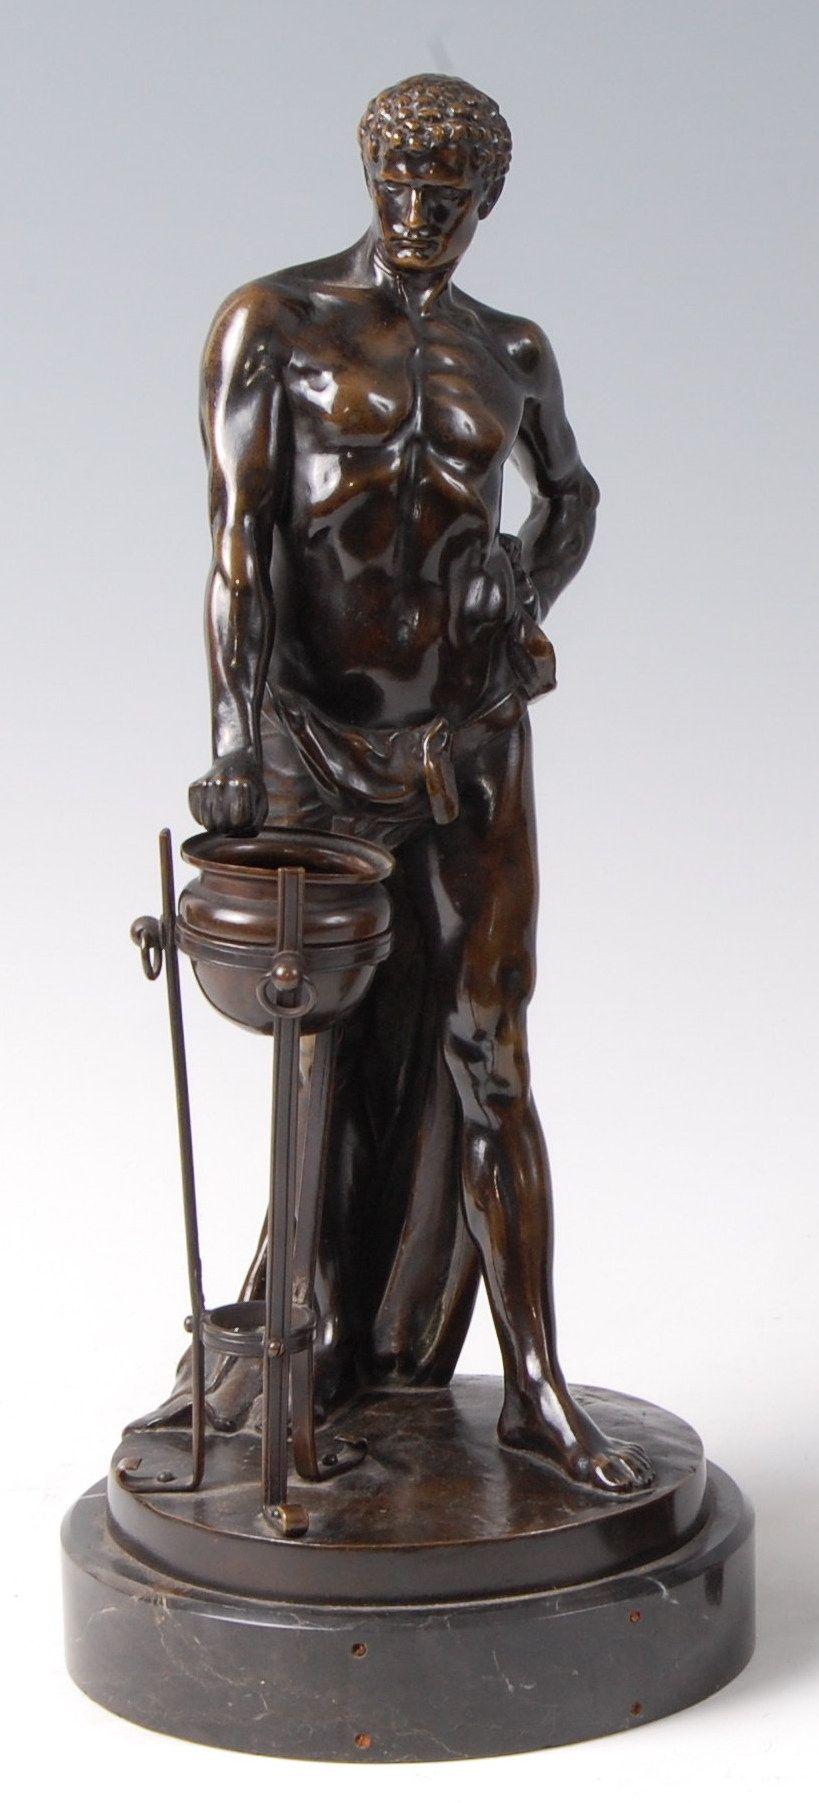 Expose II Female Nude Statue, STU-Home, AAWU76094A1